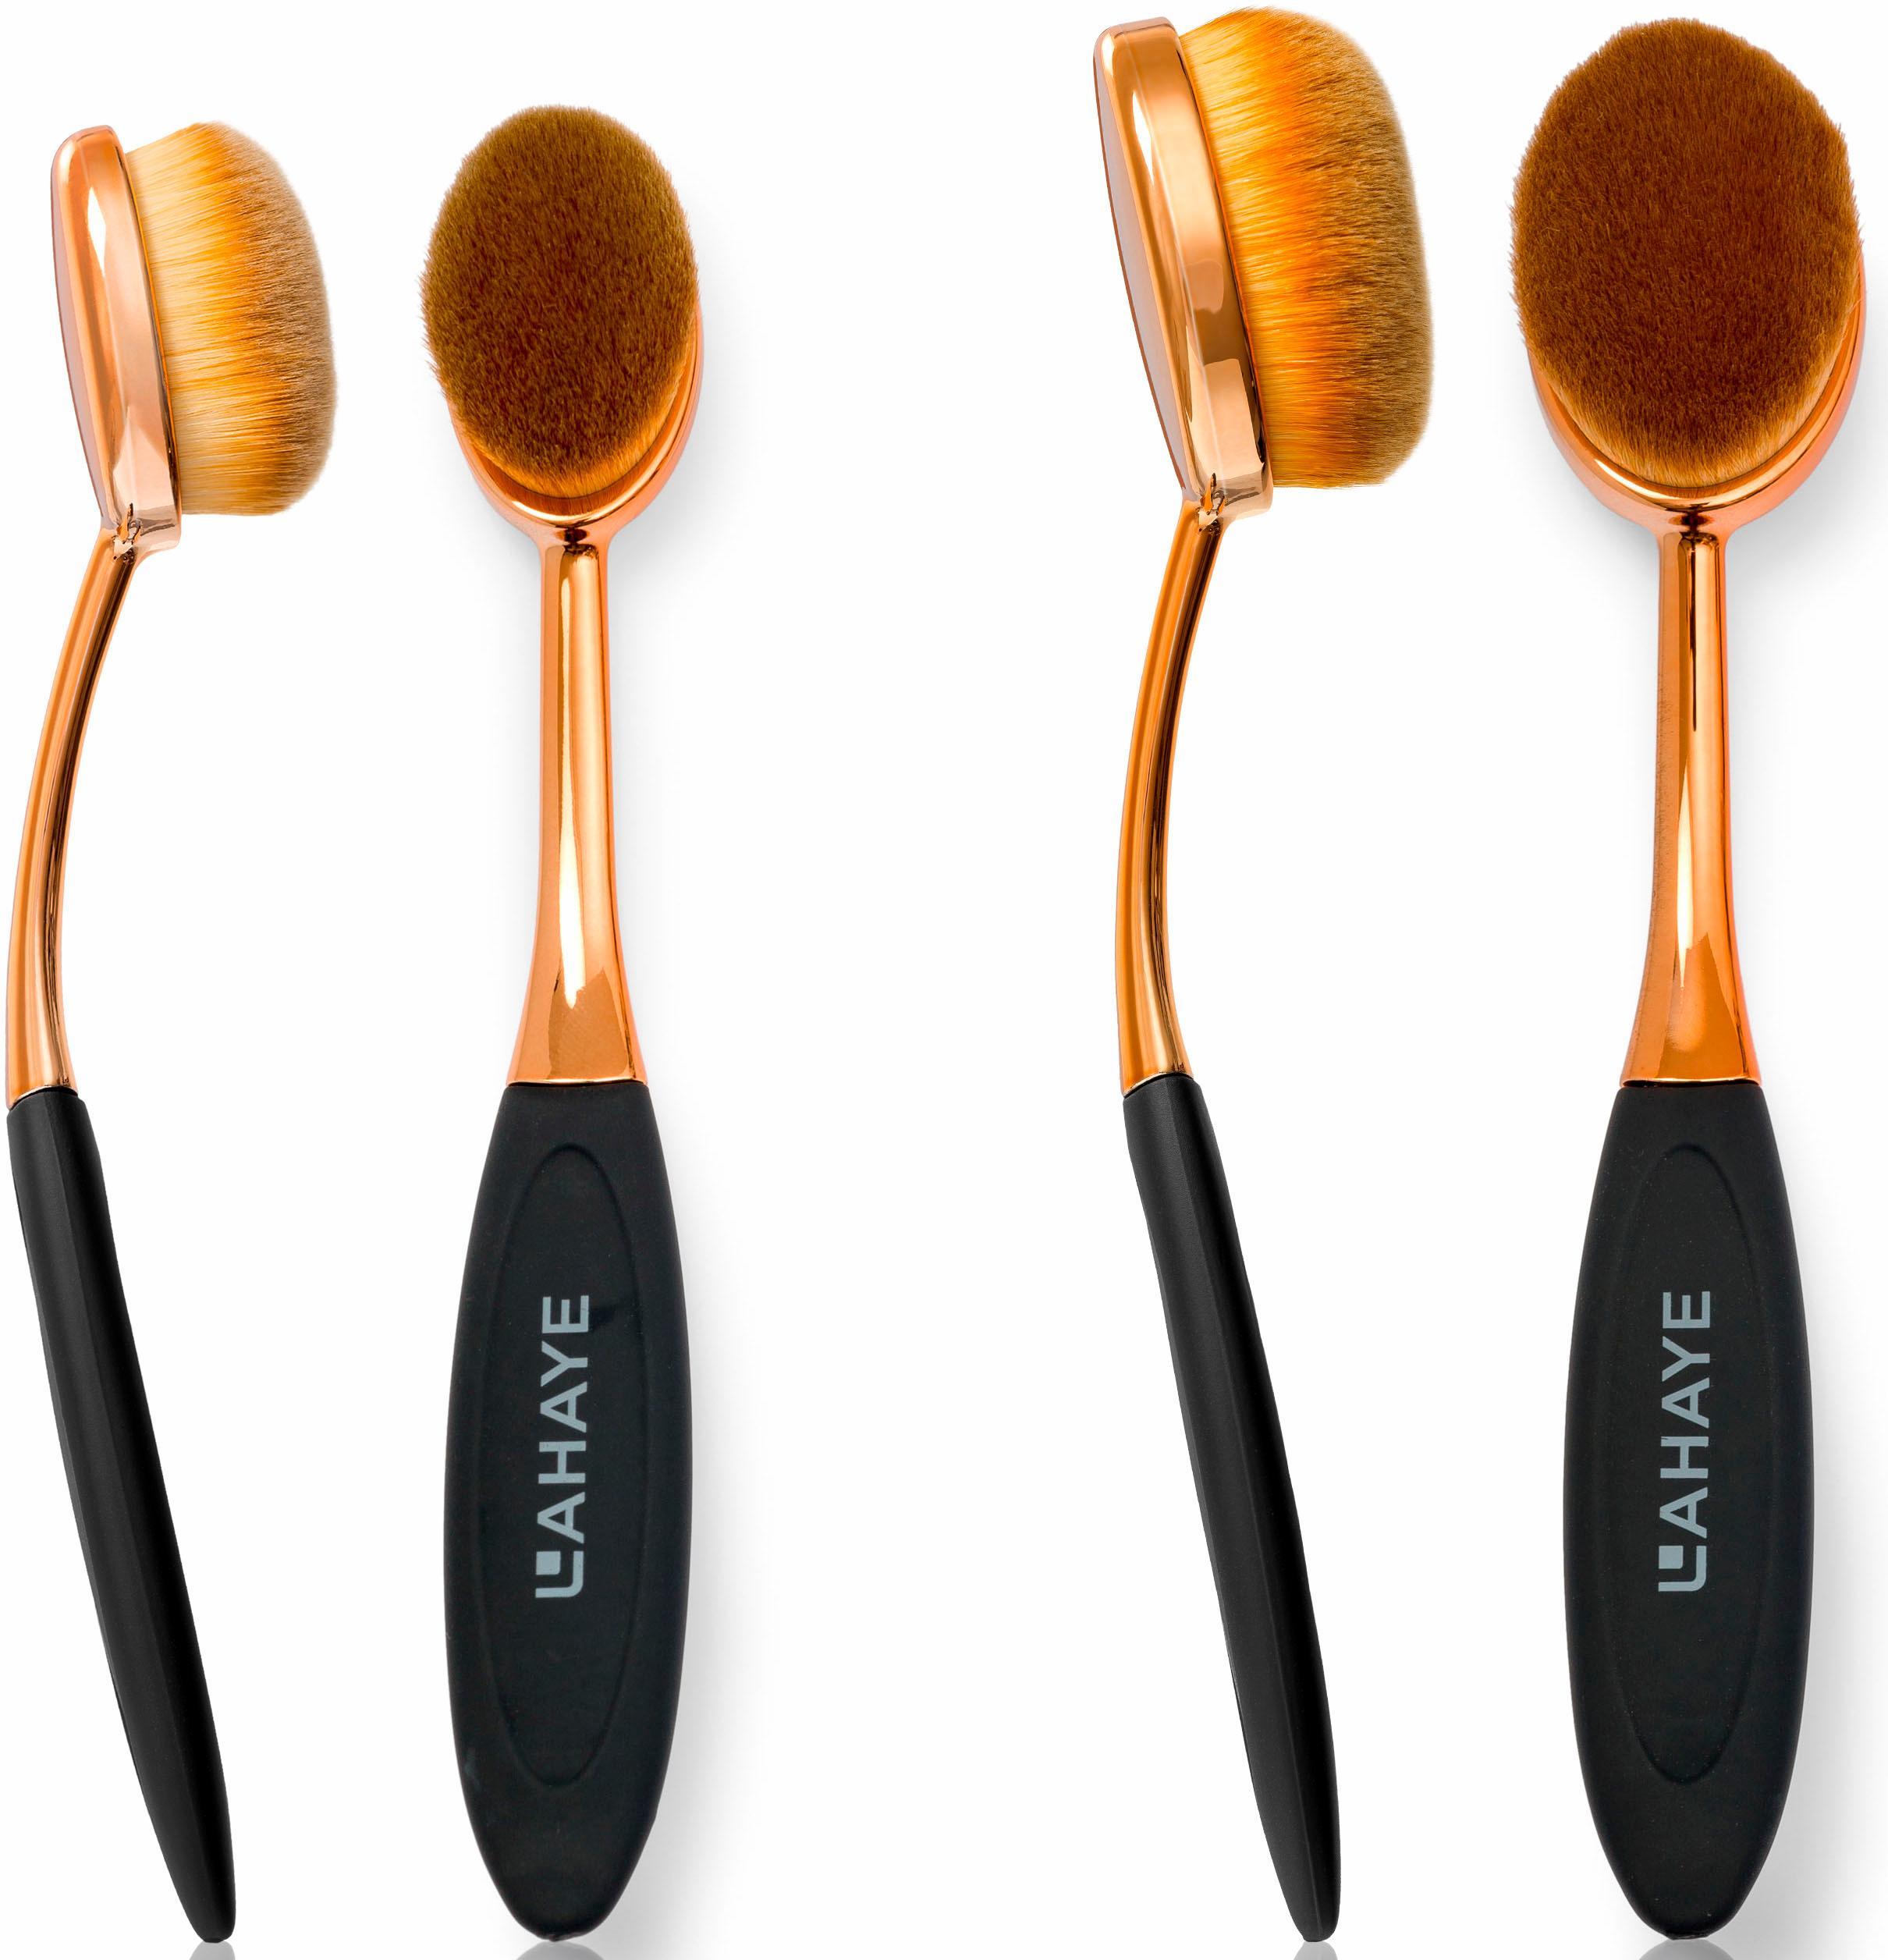 Lahaye Make-up Brush Set Oval Pinselset (2-tlg) Preisvergleich